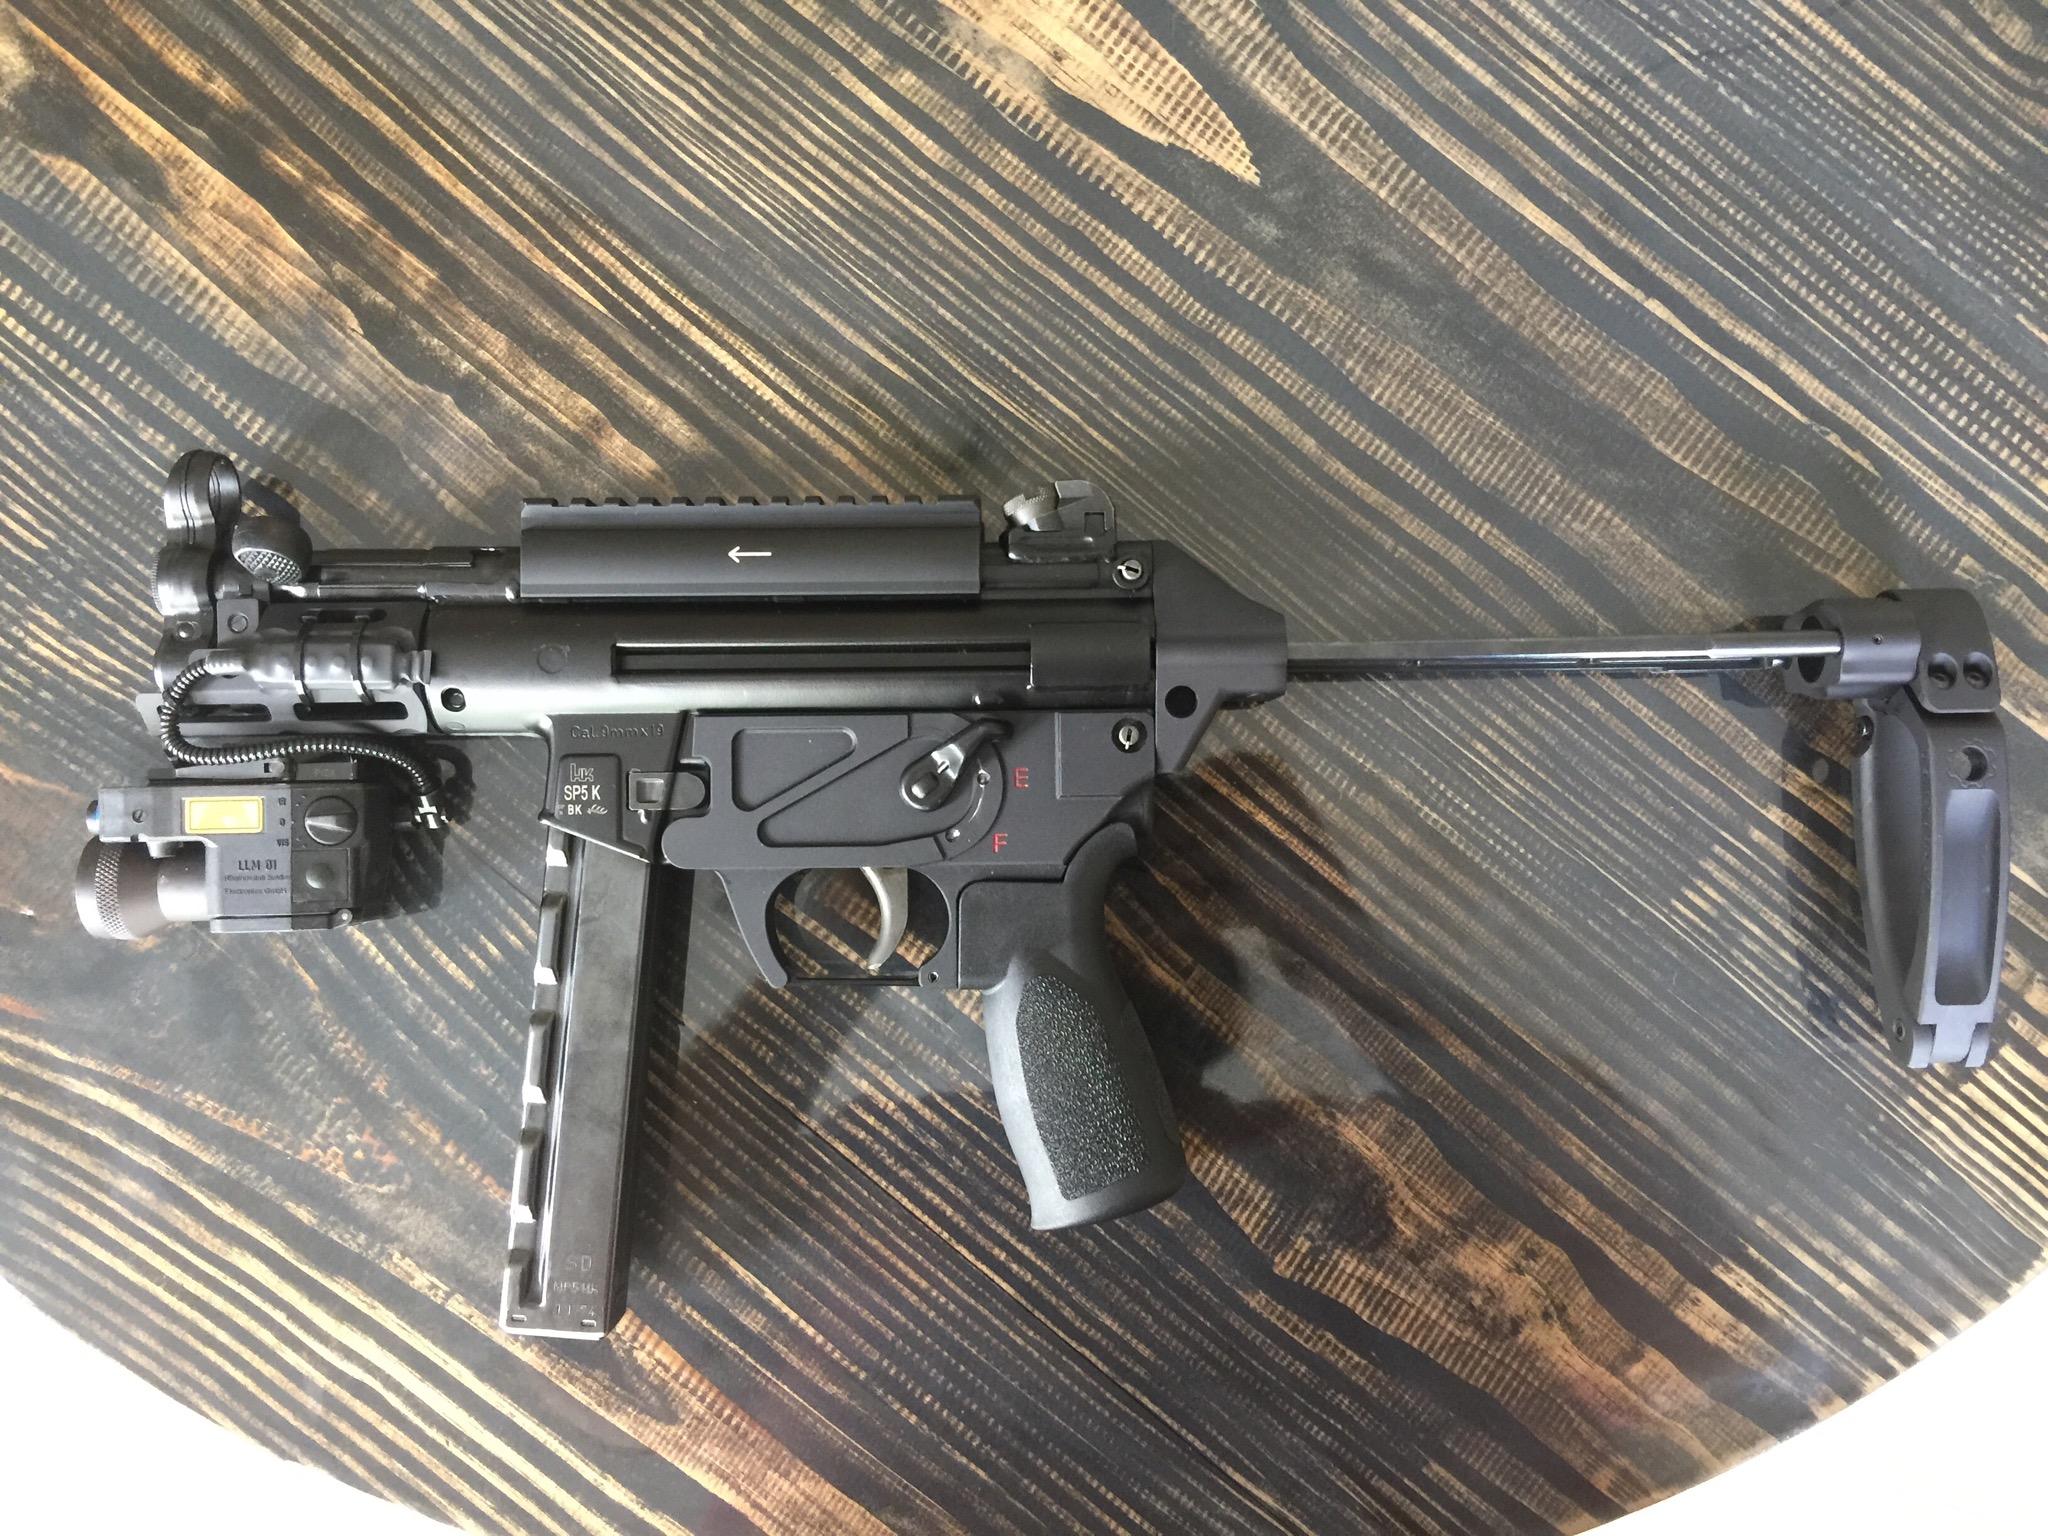 New HK sp5k-c54aa7e6-3c8a-4310-bffb-0de8231cc1c4.jpeg